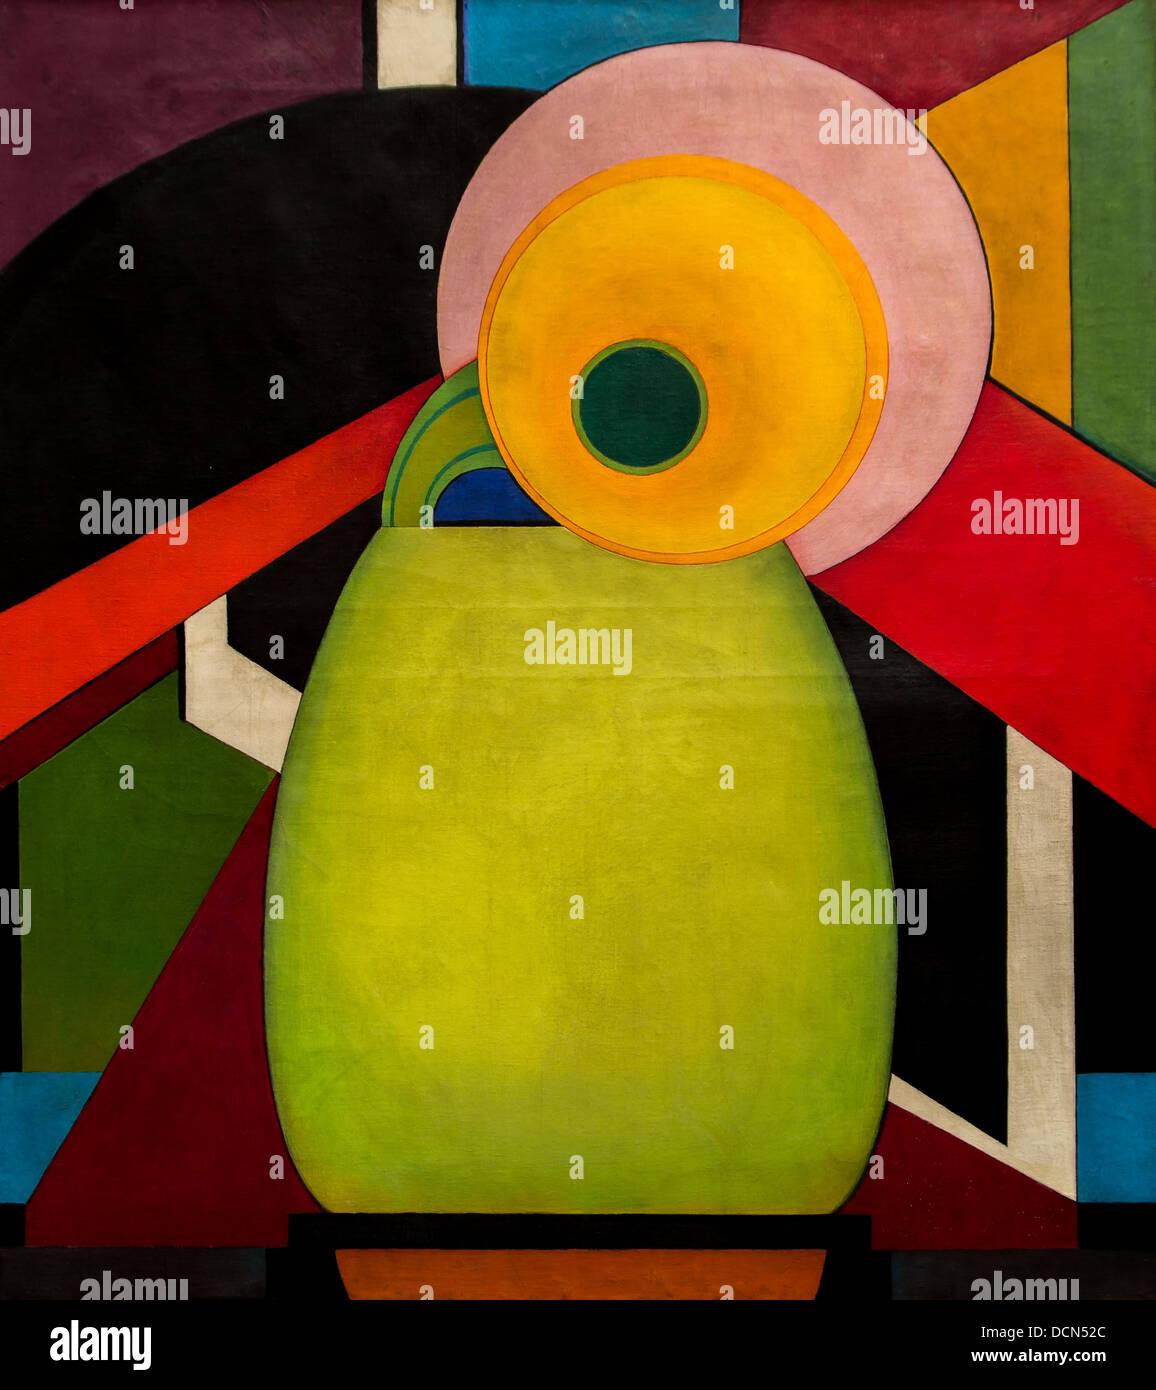 20th century  -  The sunflower - Edward Steichen (1920) Philippe Sauvan-Magnet / Active Museum - Stock Image